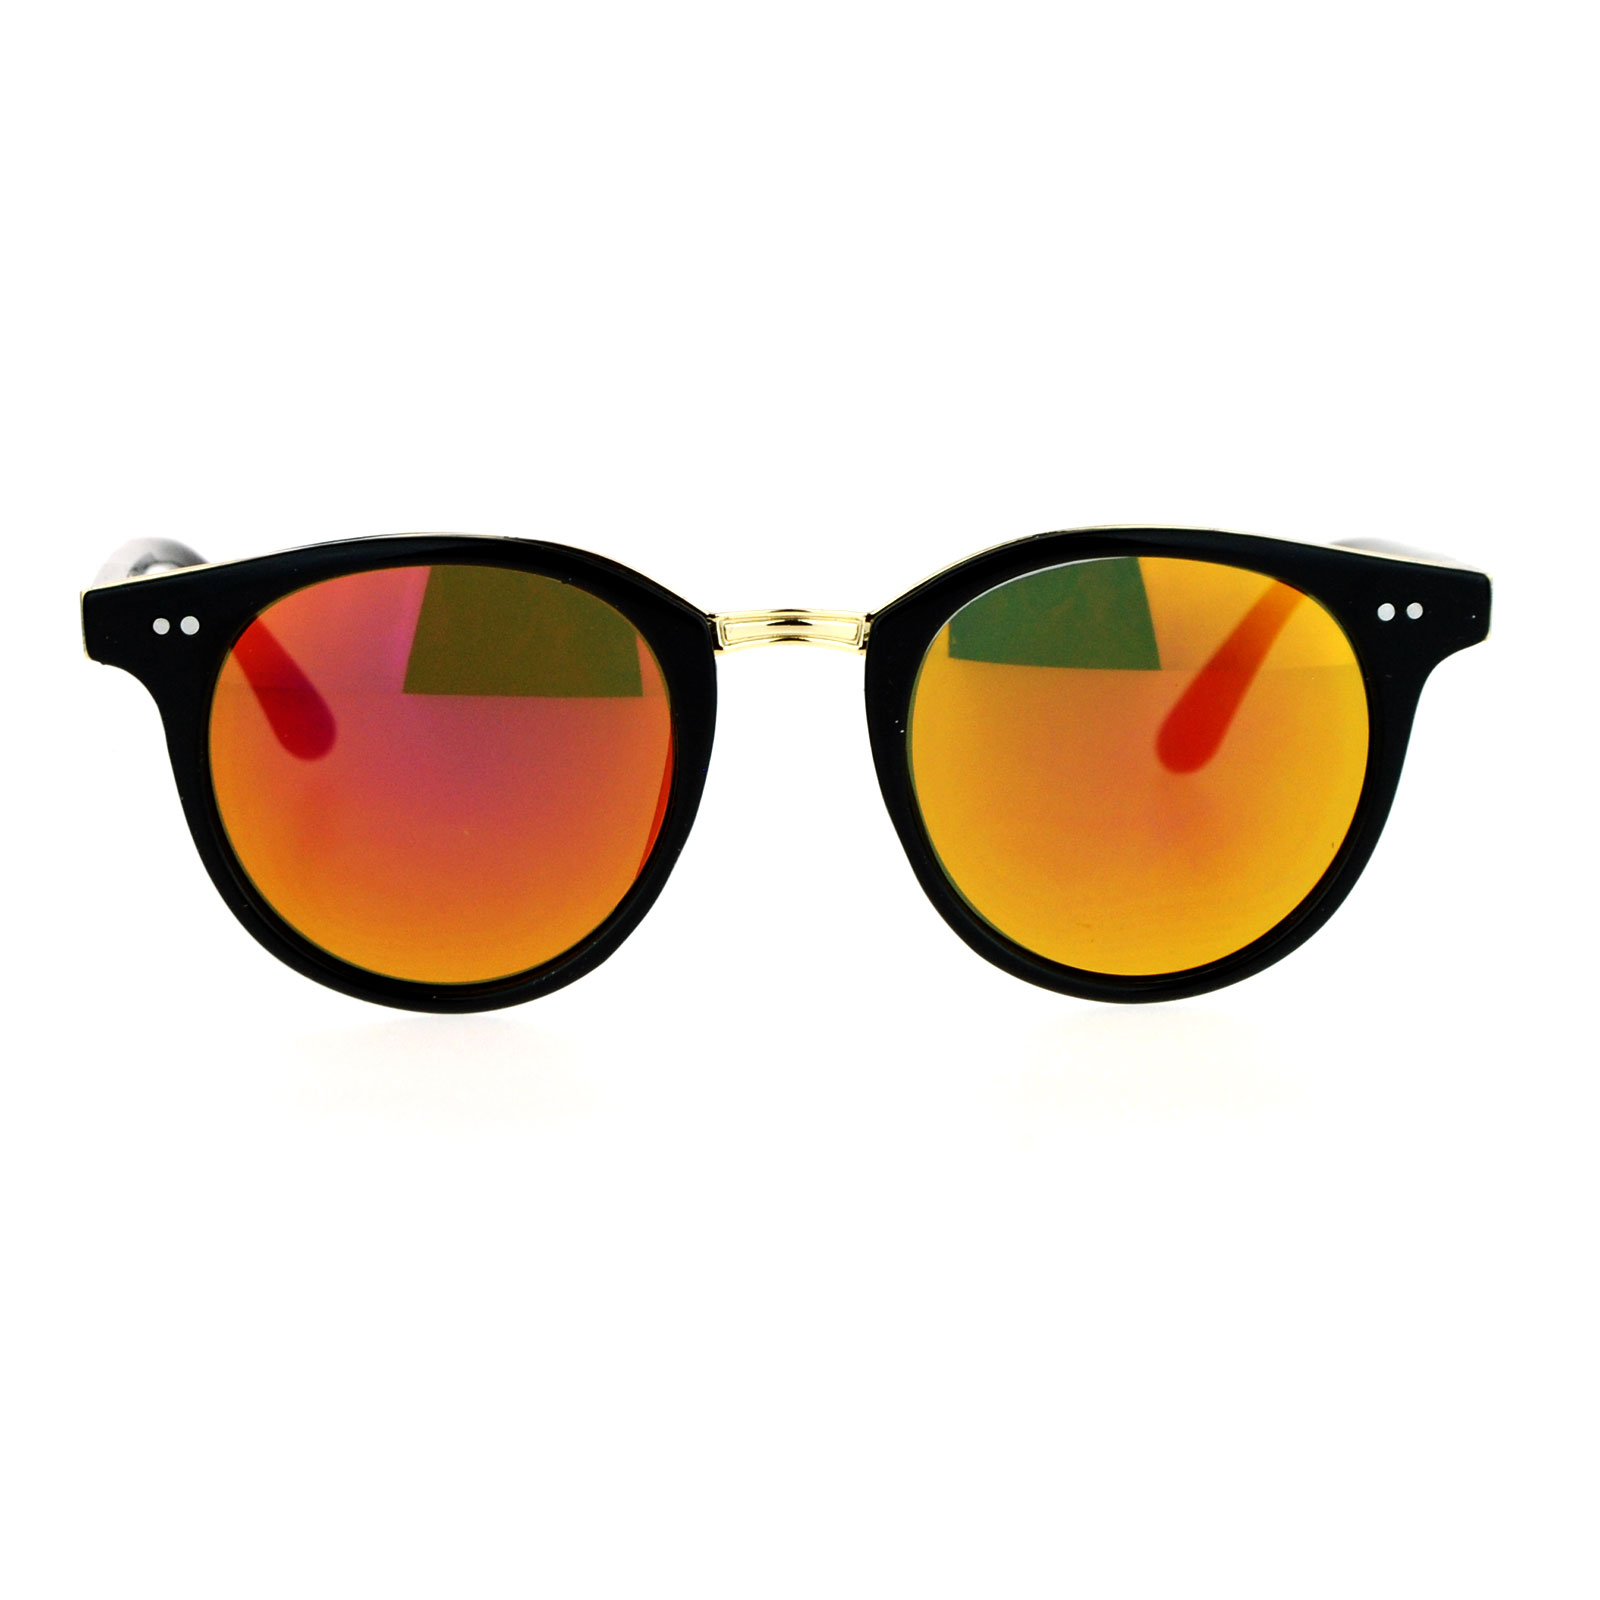 SA106 Vintage Classic Horn Rim Keyhole Sunglasses Black Orange